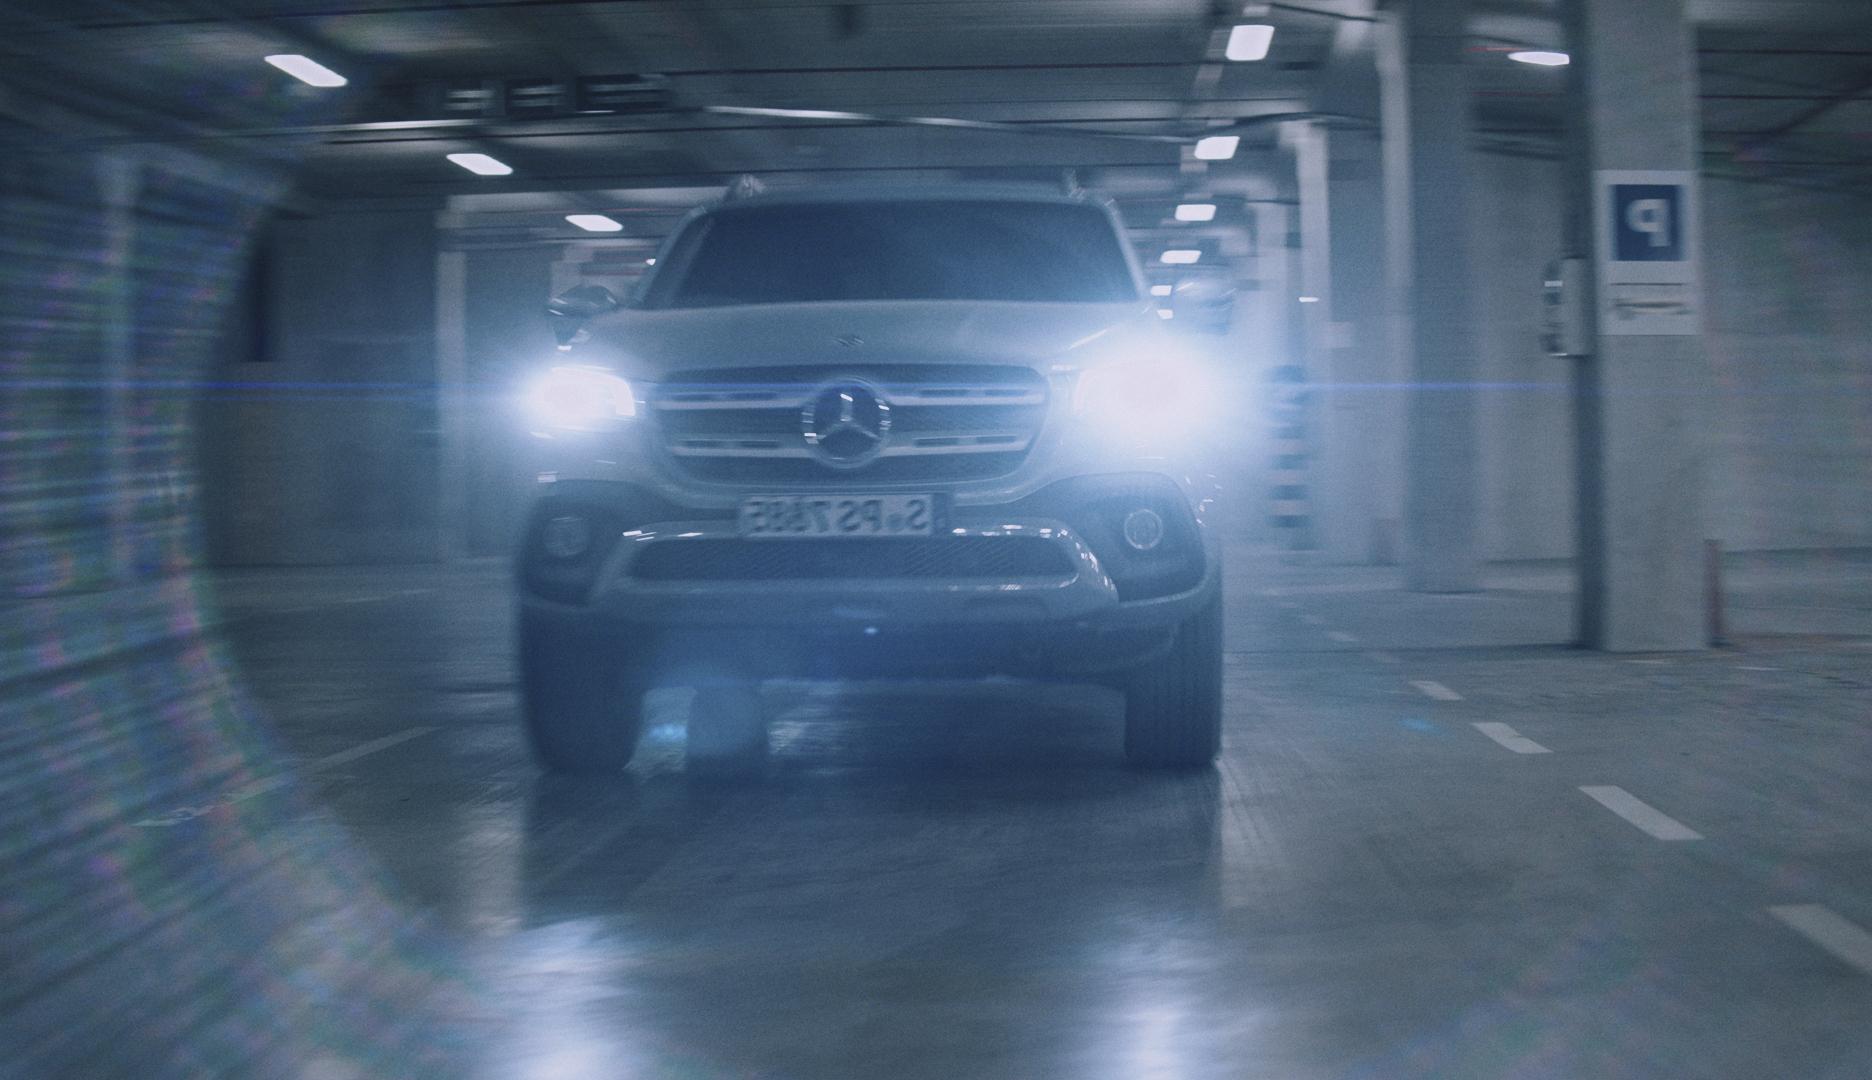 Mercedes X-Class - Eyes_1.7.1.jpg